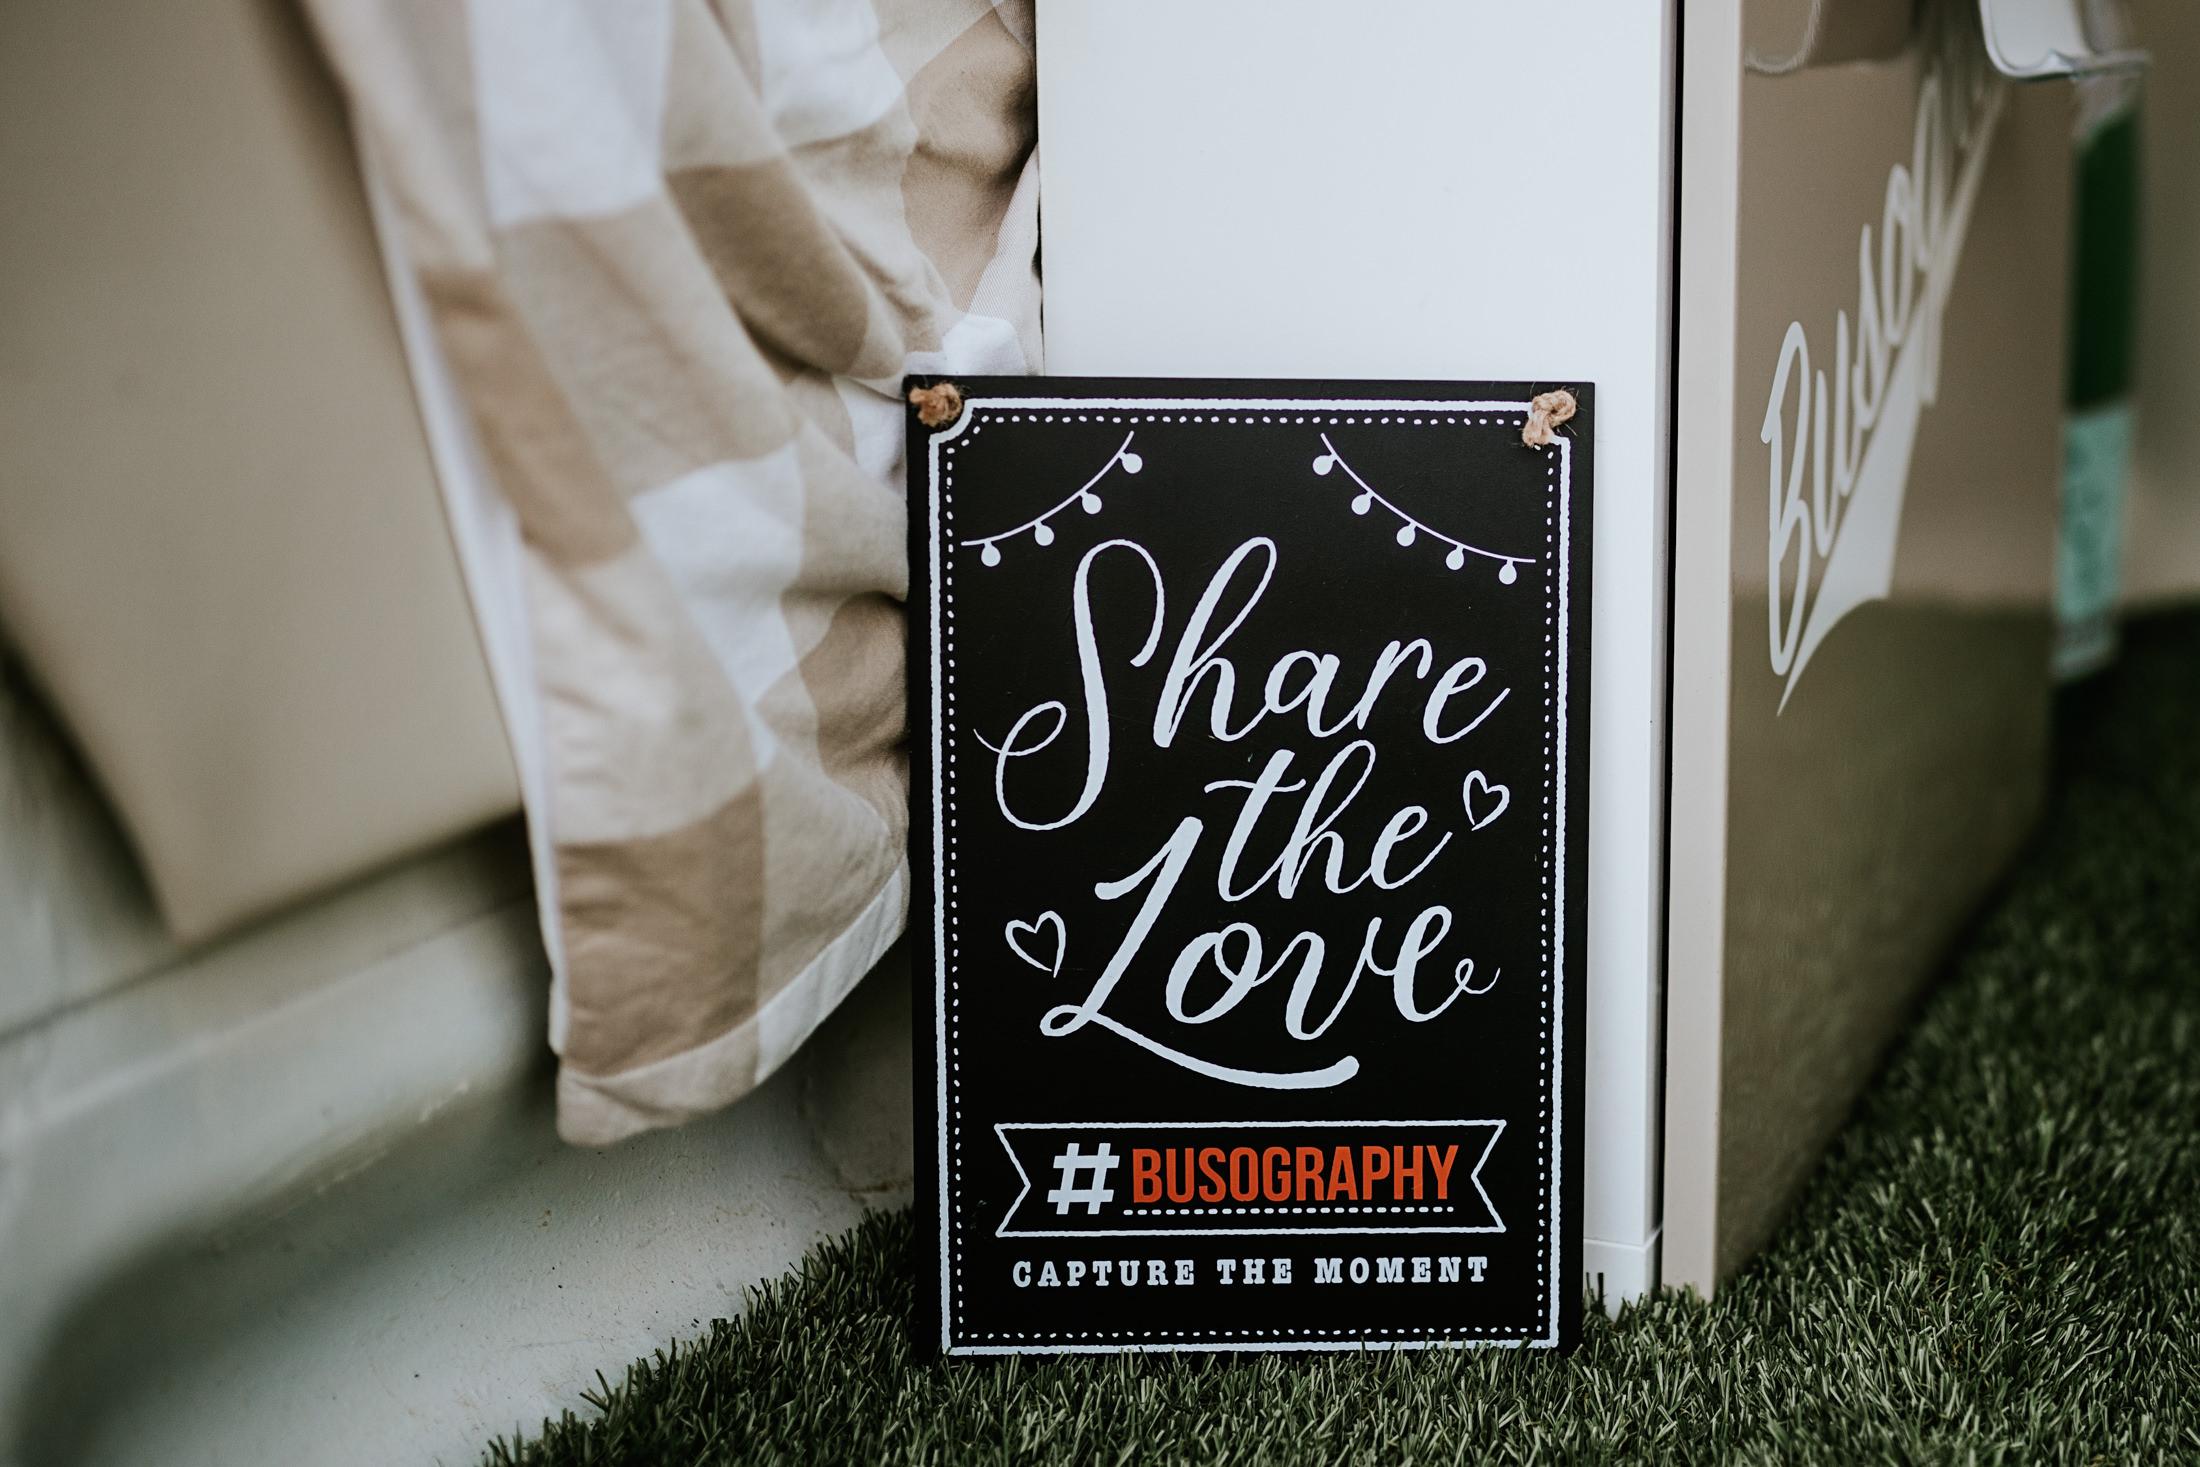 camper van photo booth - wedding photo booth - wedding camper van - outdoor weddings - outdoor wedding entertainment